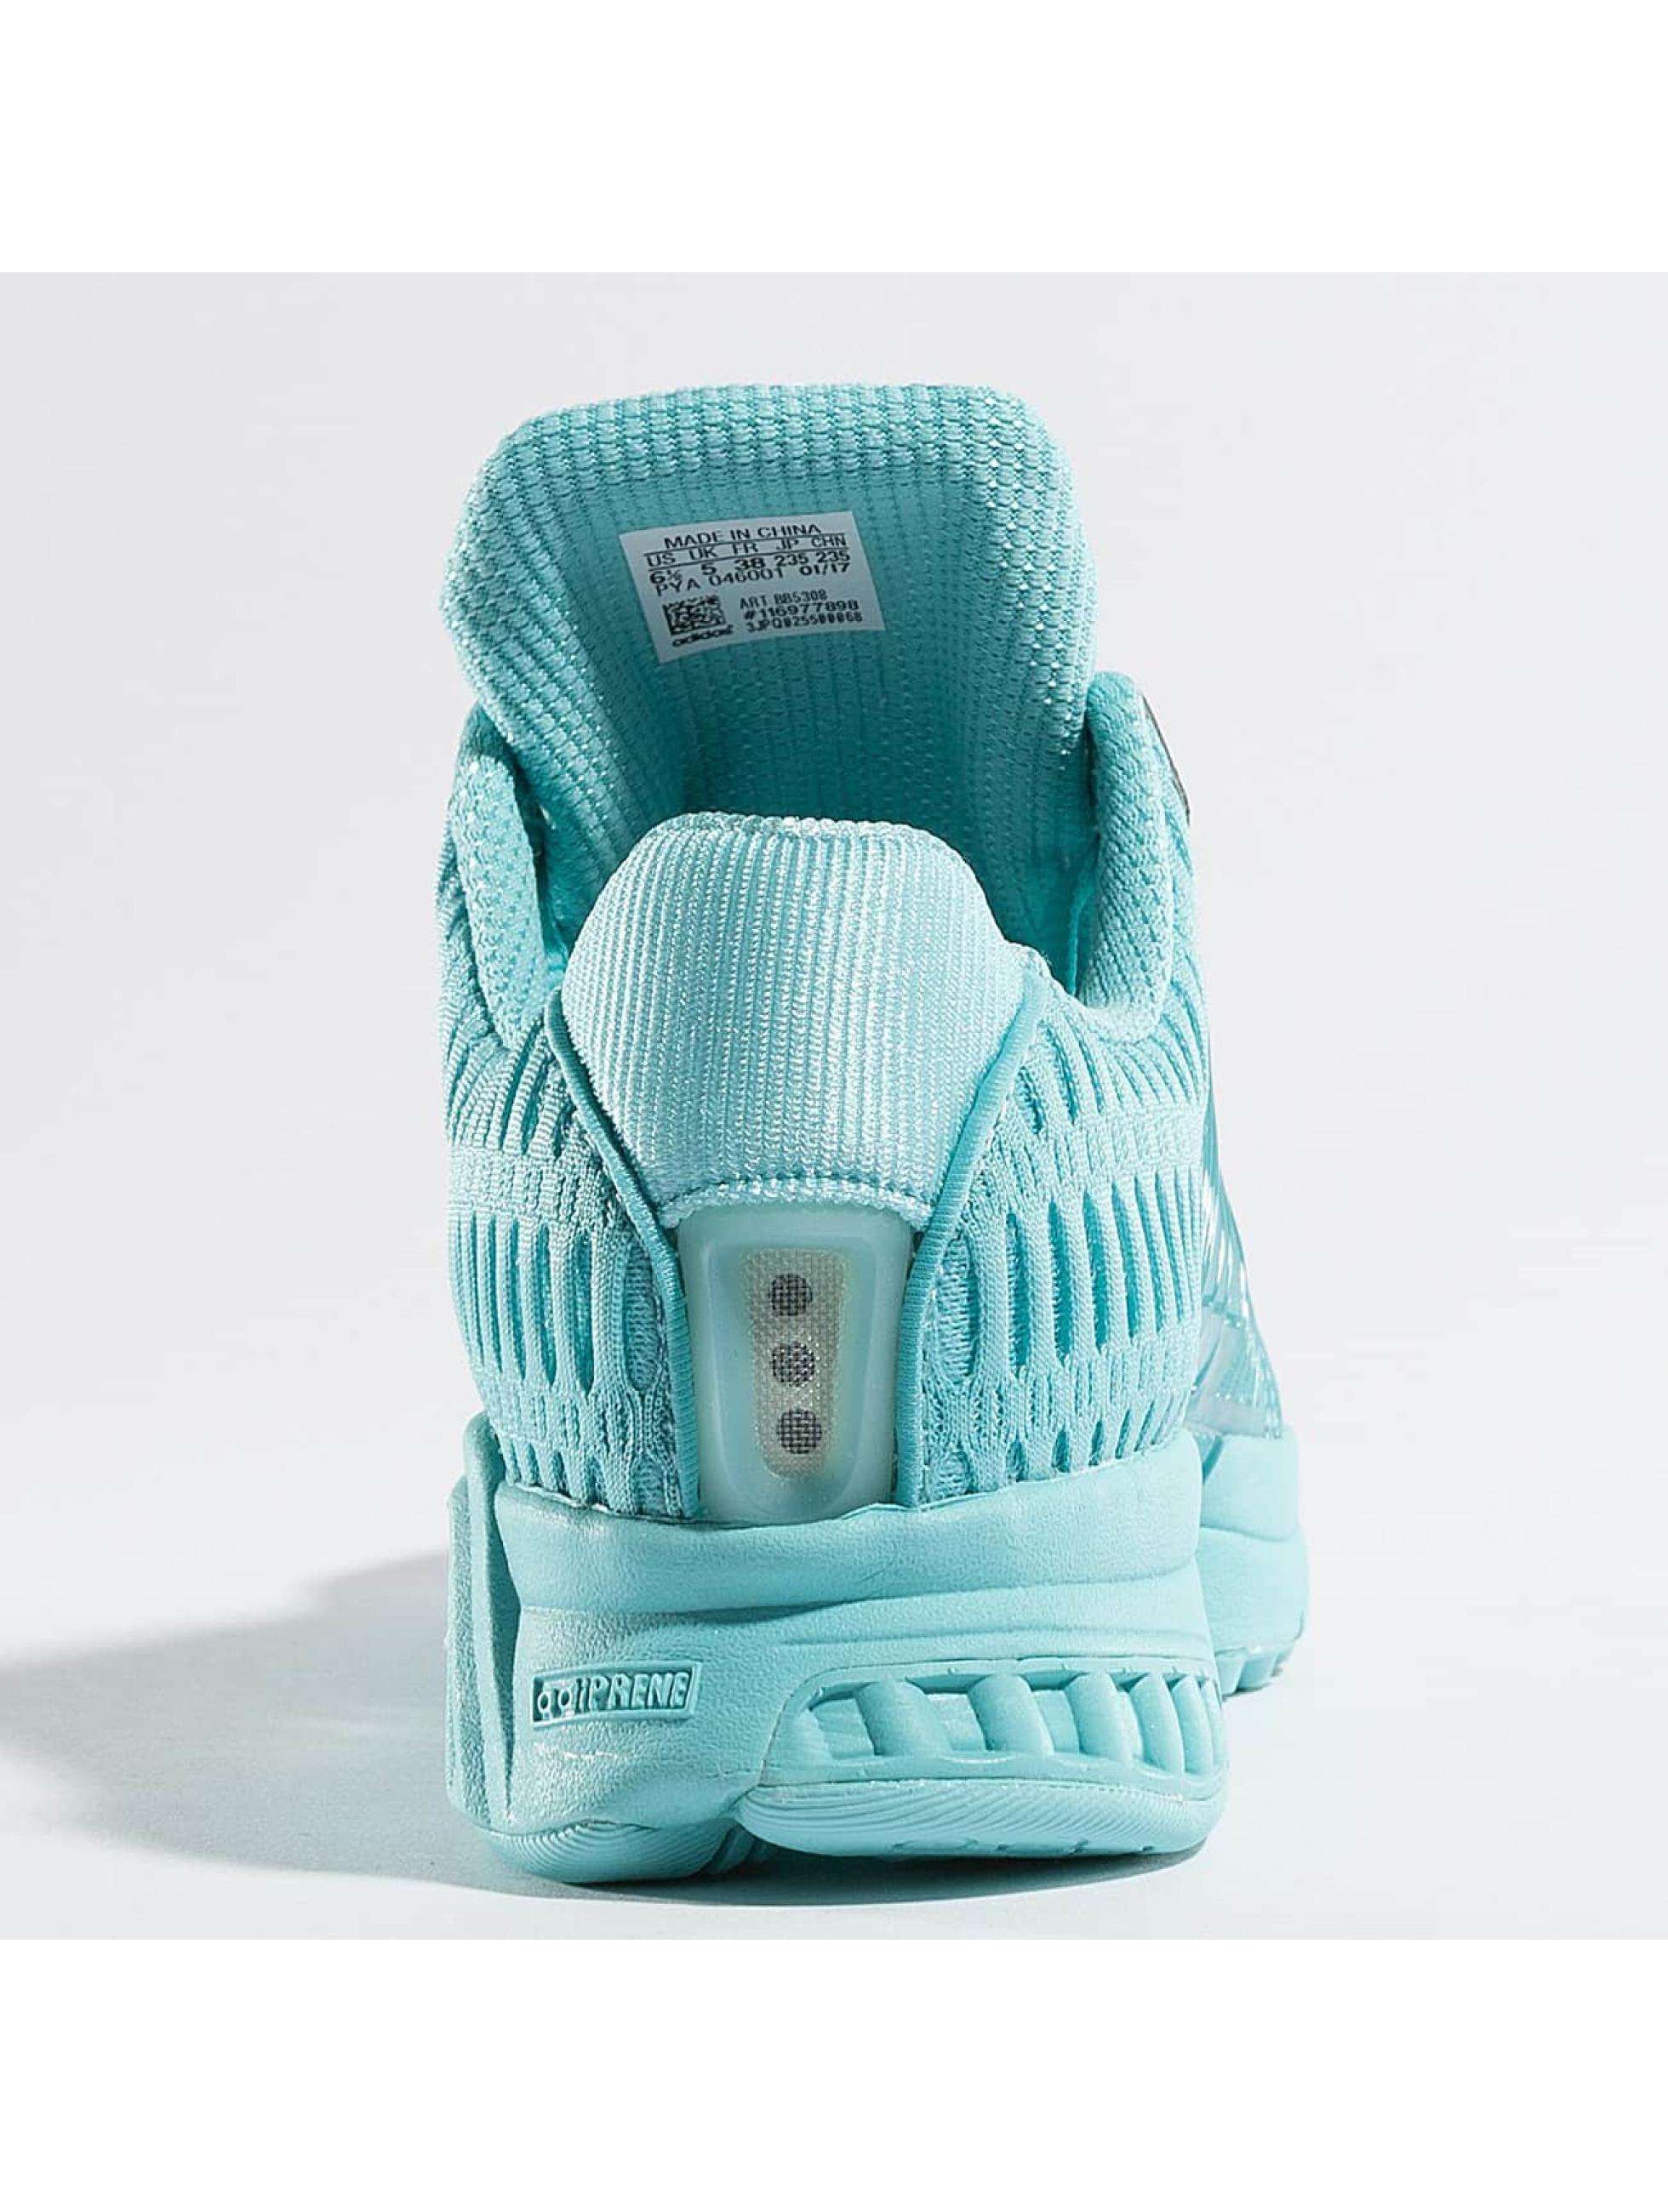 adidas originals Sneaker Climacool grün